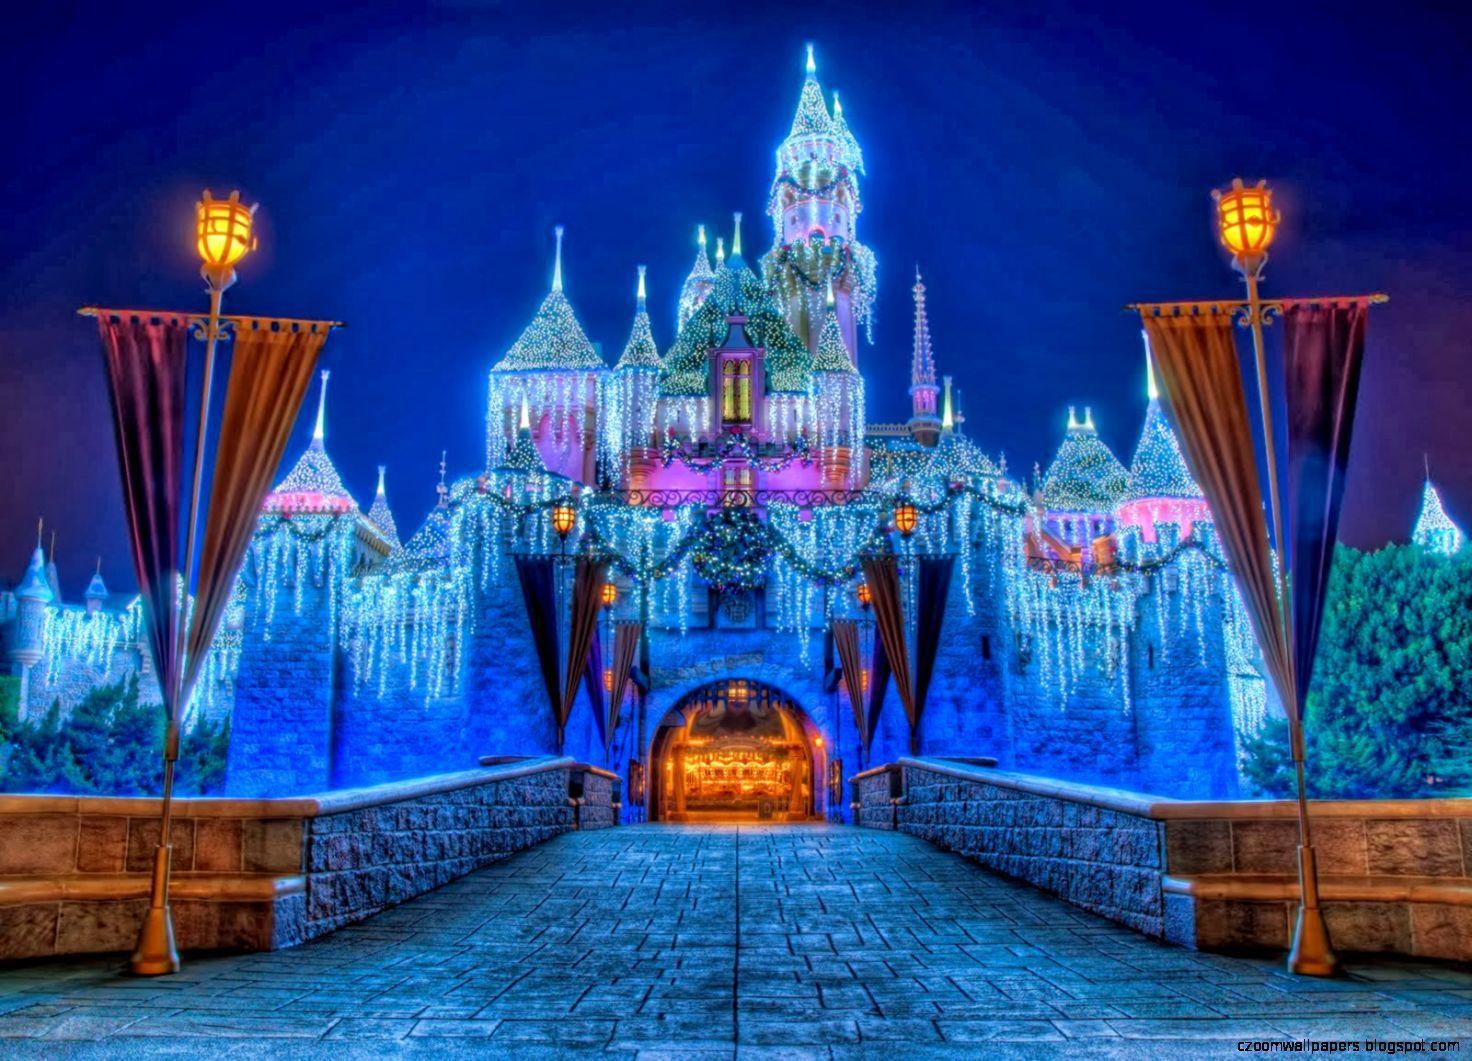 Frozen Castle Wallpapers - Top Free Frozen Castle Backgrounds - WallpaperAccess